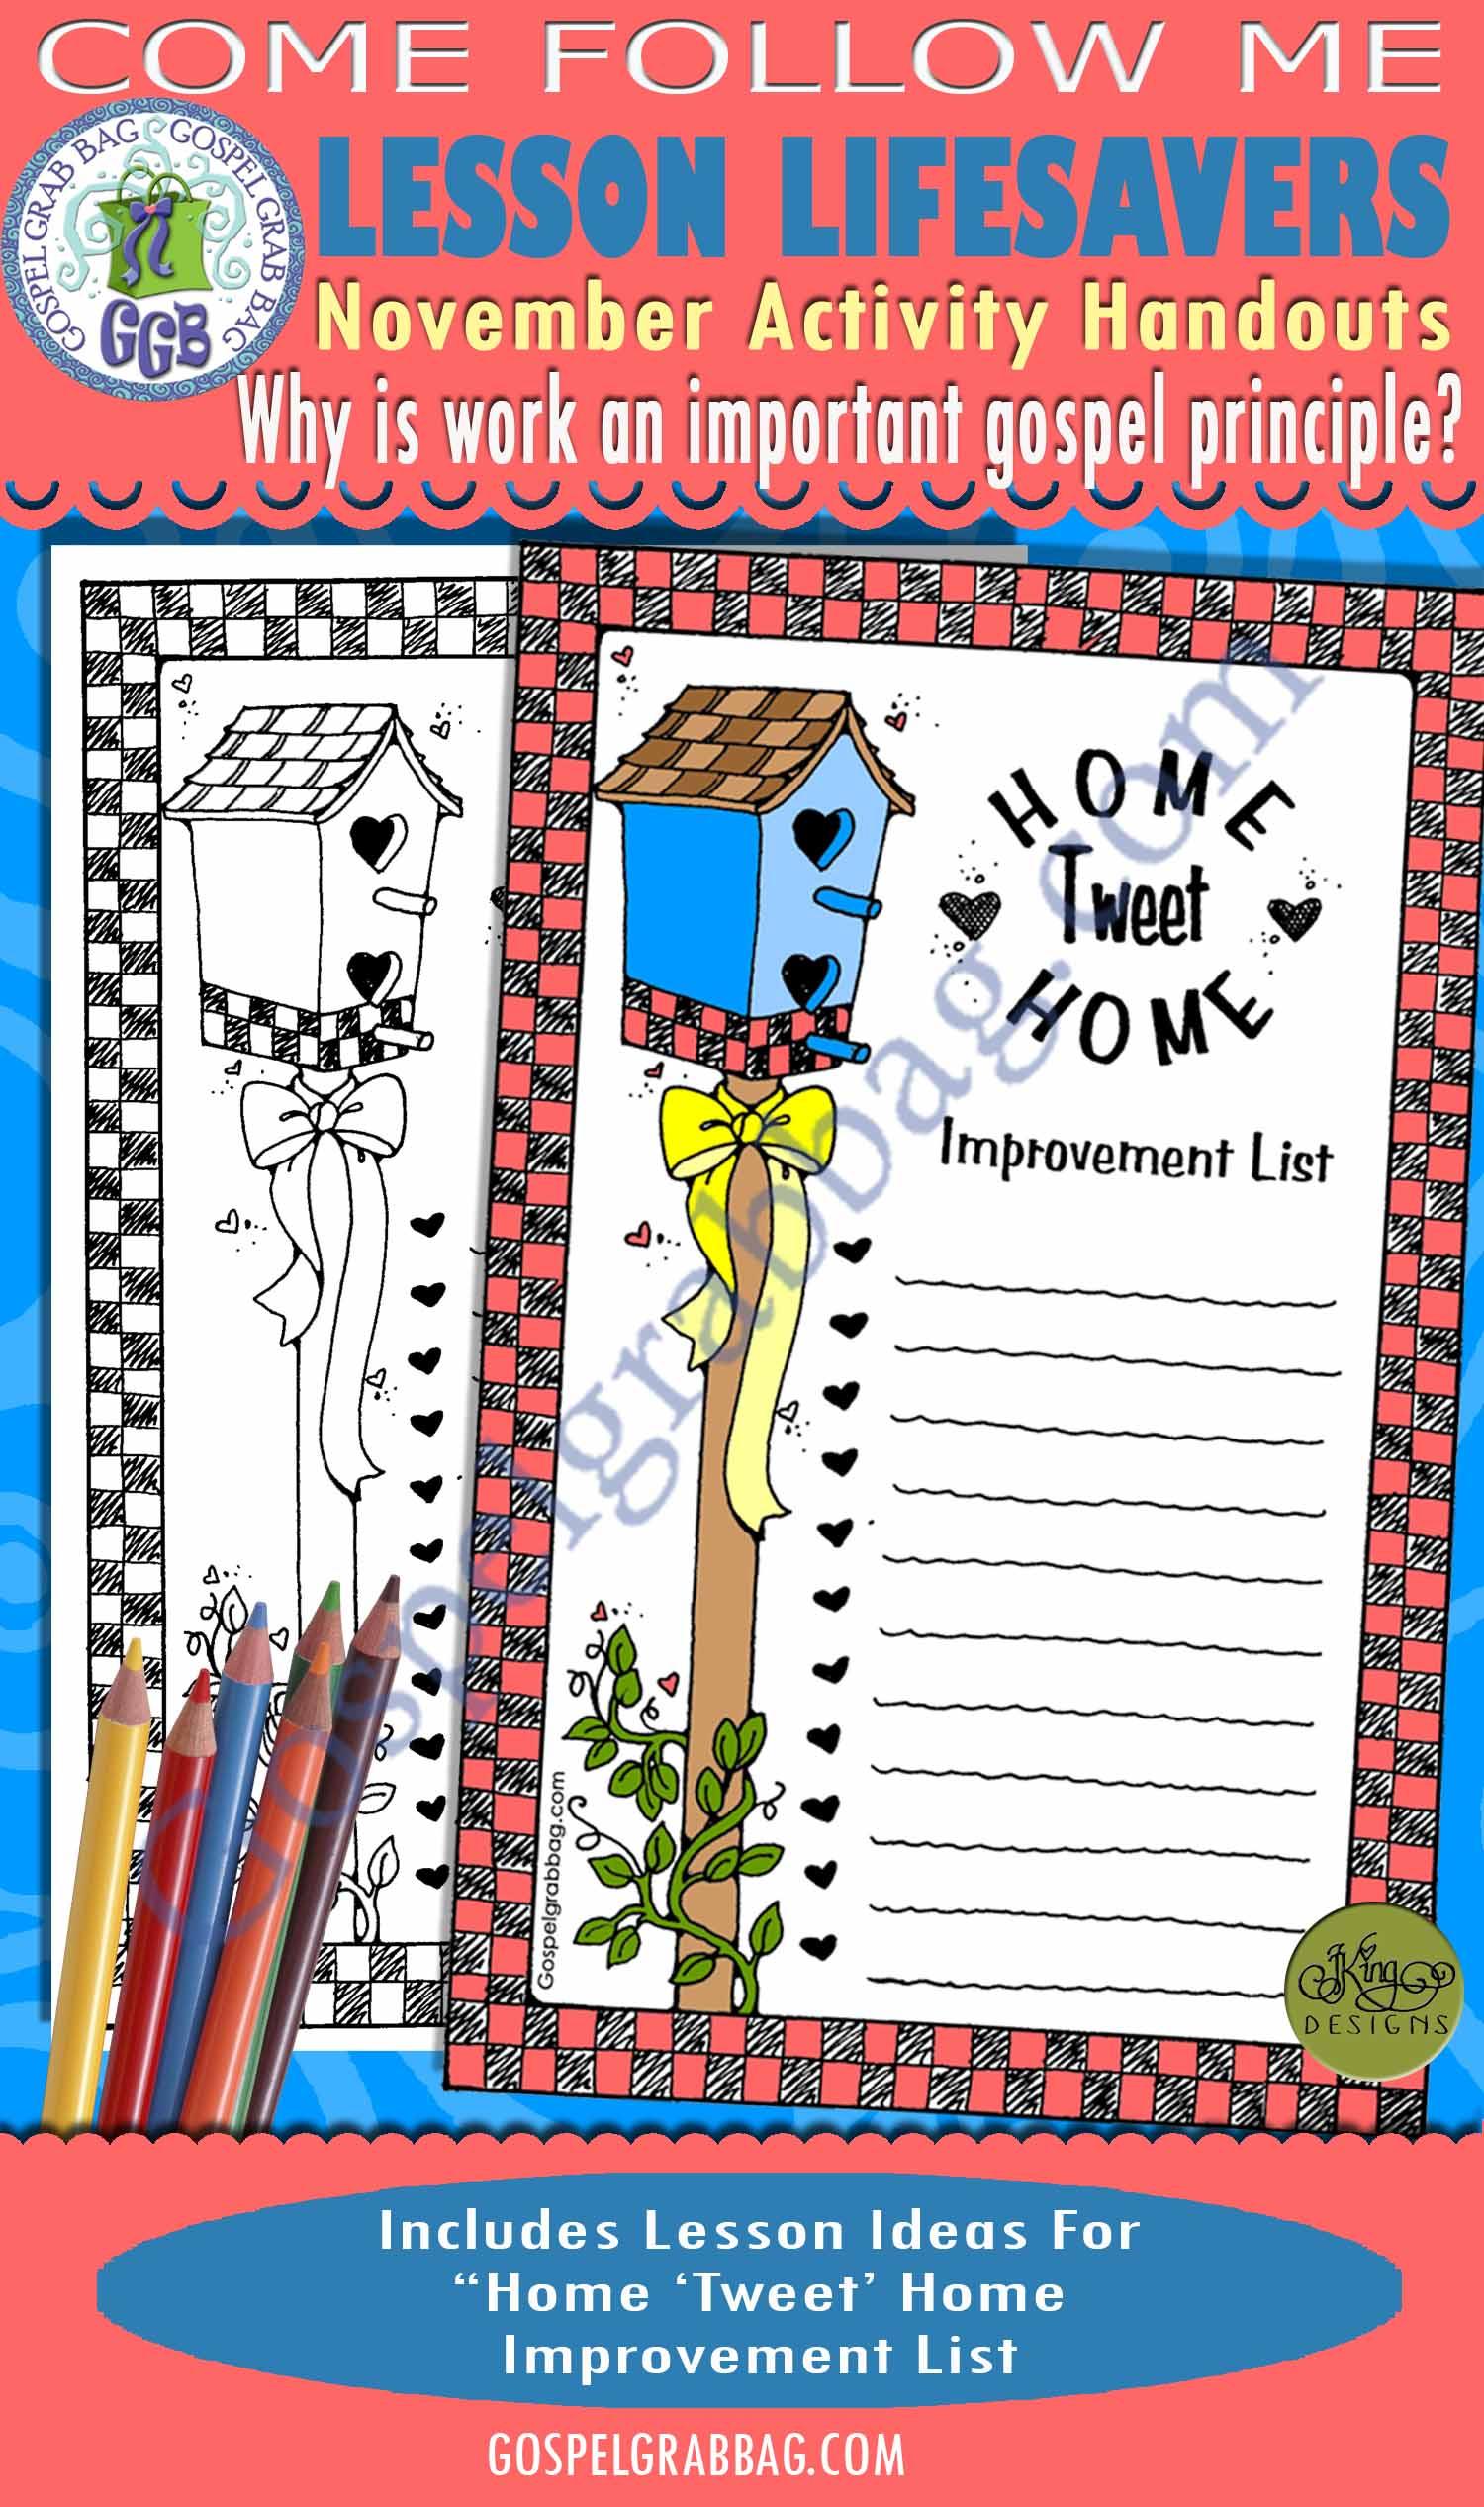 "$175 SELF-RELIANCE - GOALS: Come Follow Me November Lesson 4 ""Why is work an important gospel principle?"" Activity: Home ""Tweet"" Home Improvement List, GospelGrabBag.com"